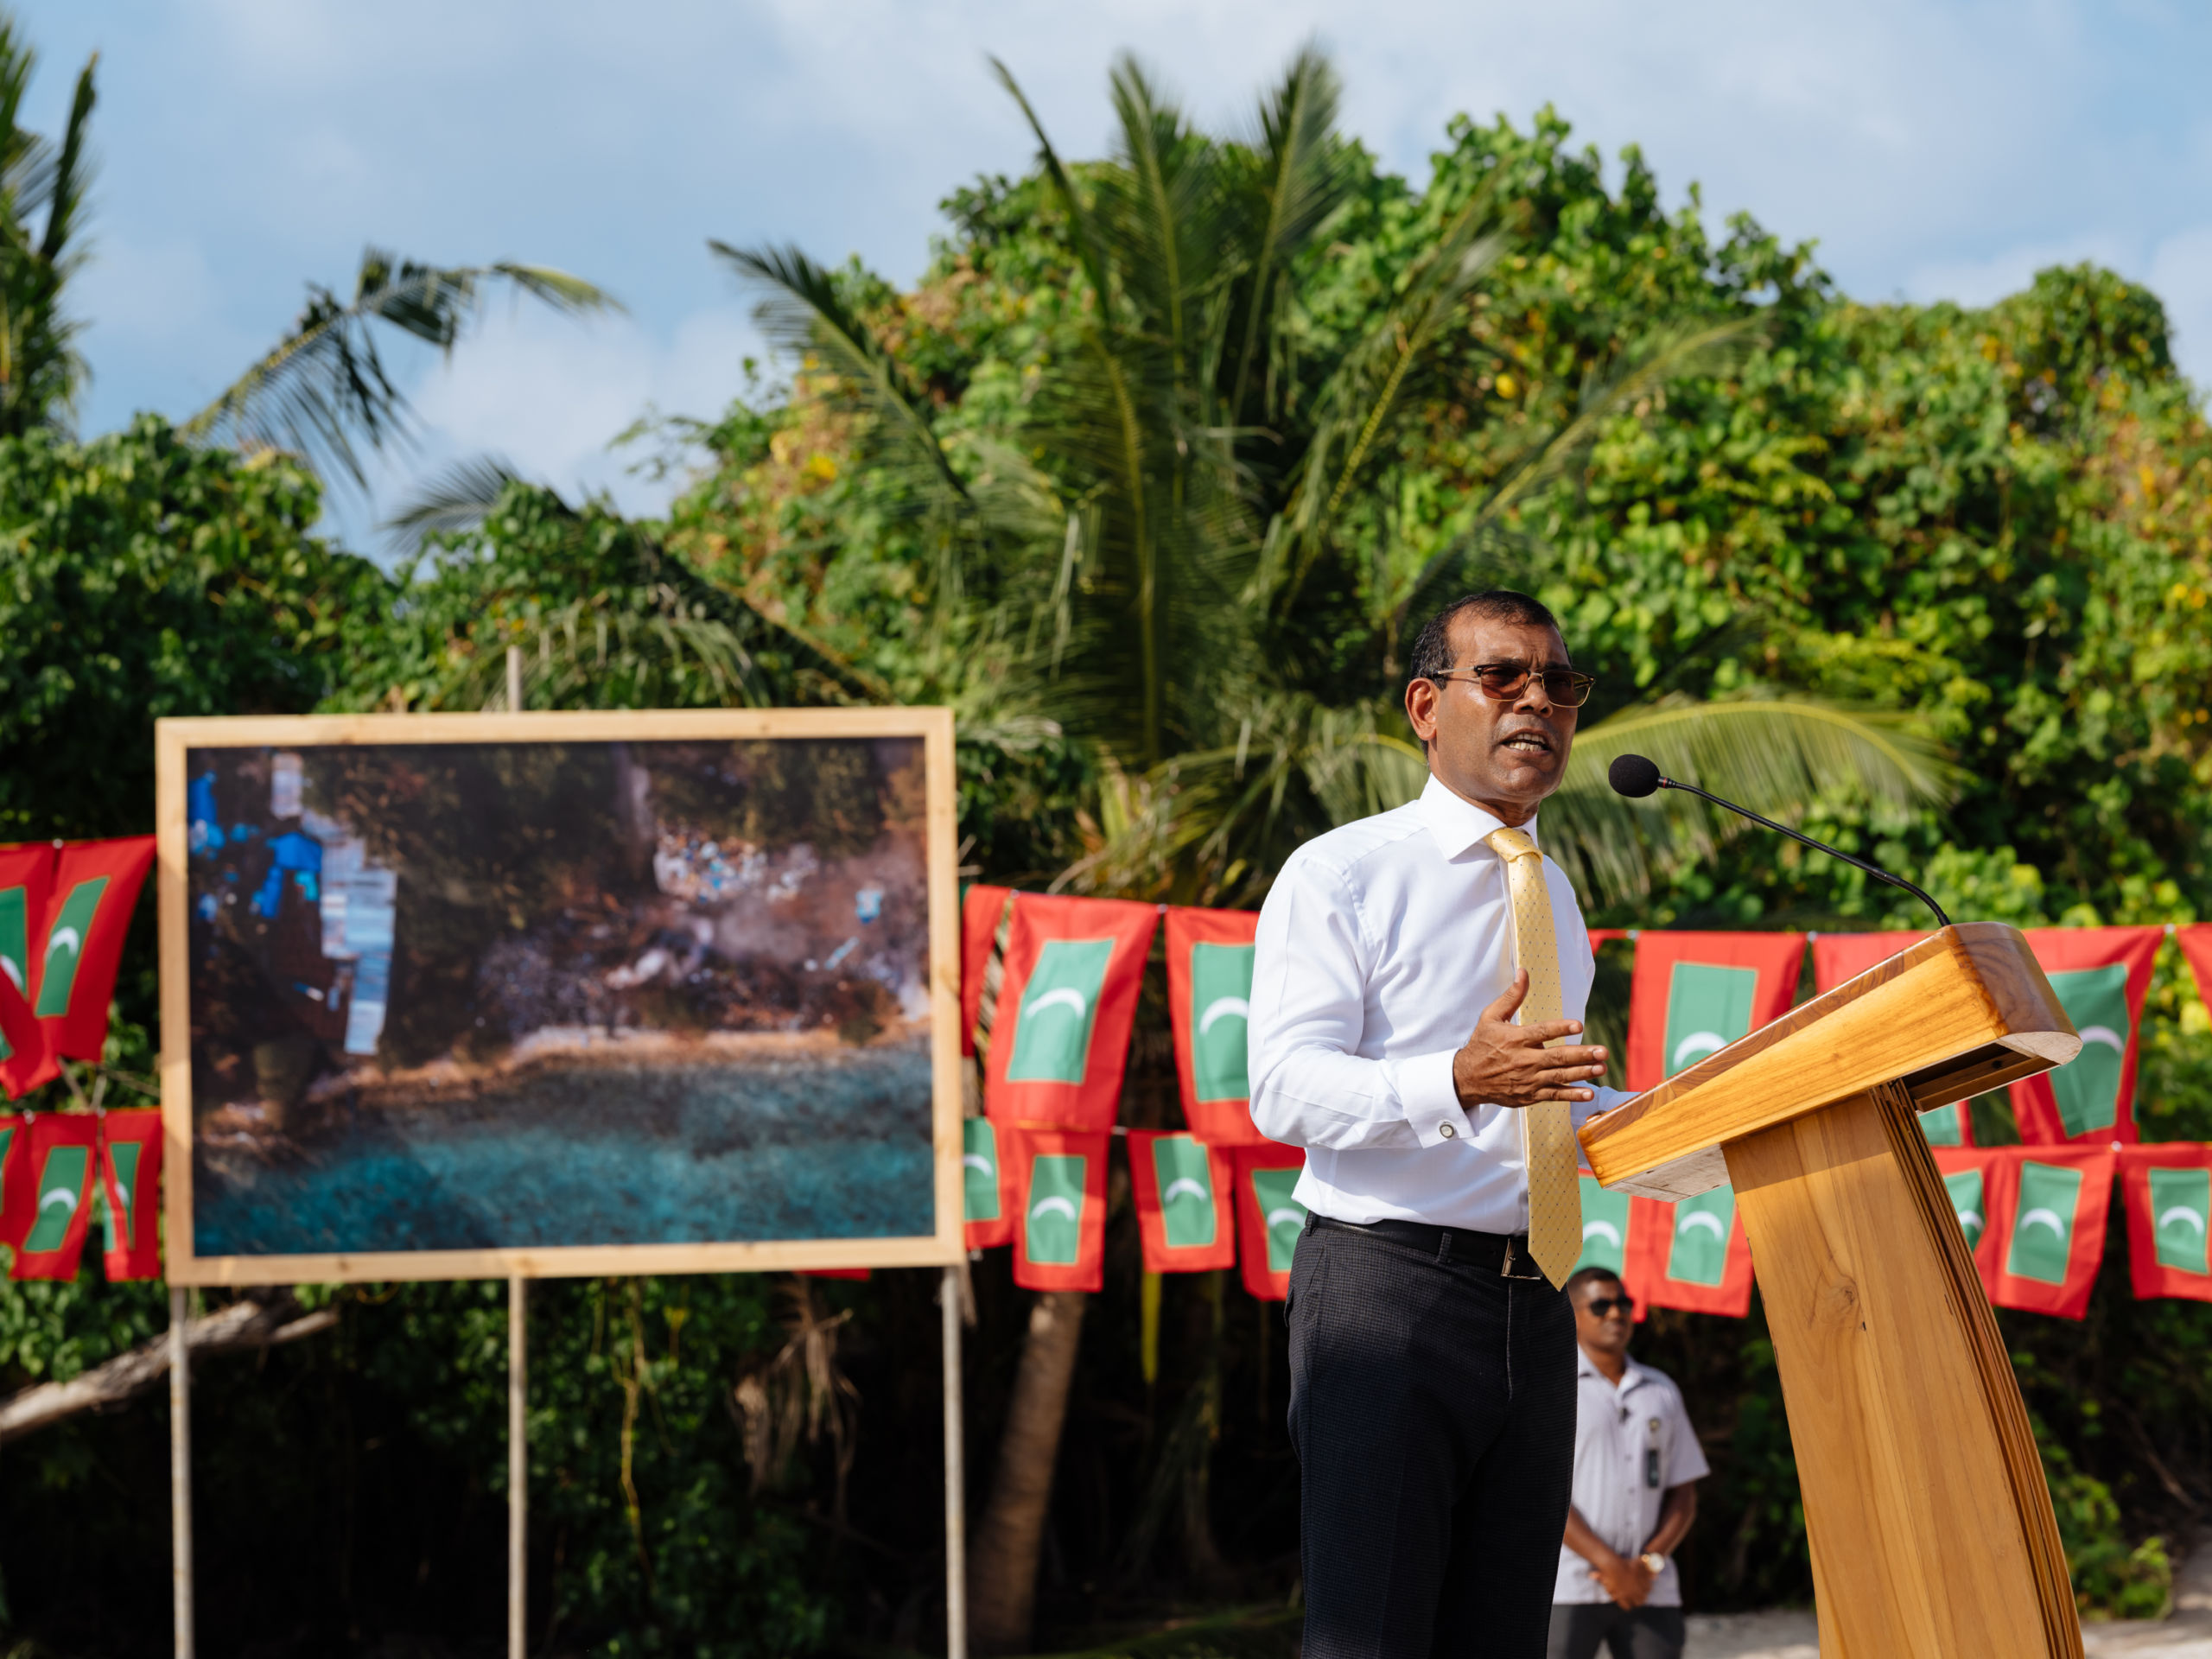 Maldives Eco-Friendly Waste Management Project